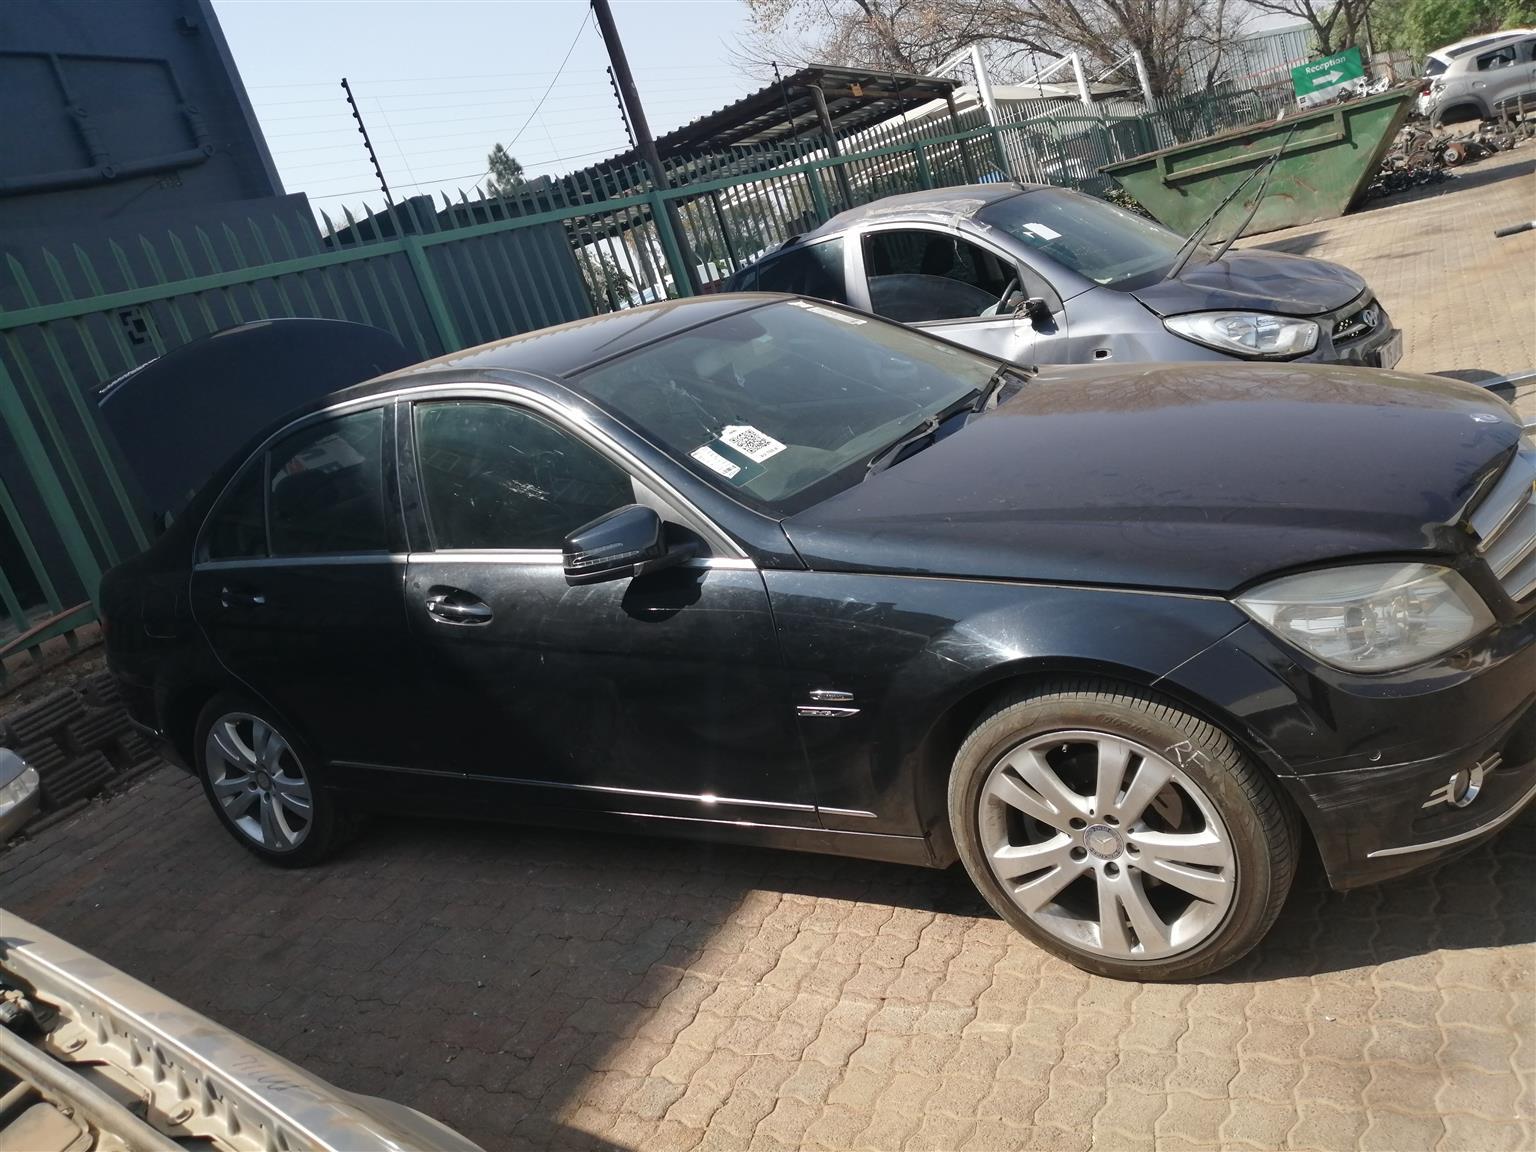 Kompressor C200 Mercedes stripping foe spares